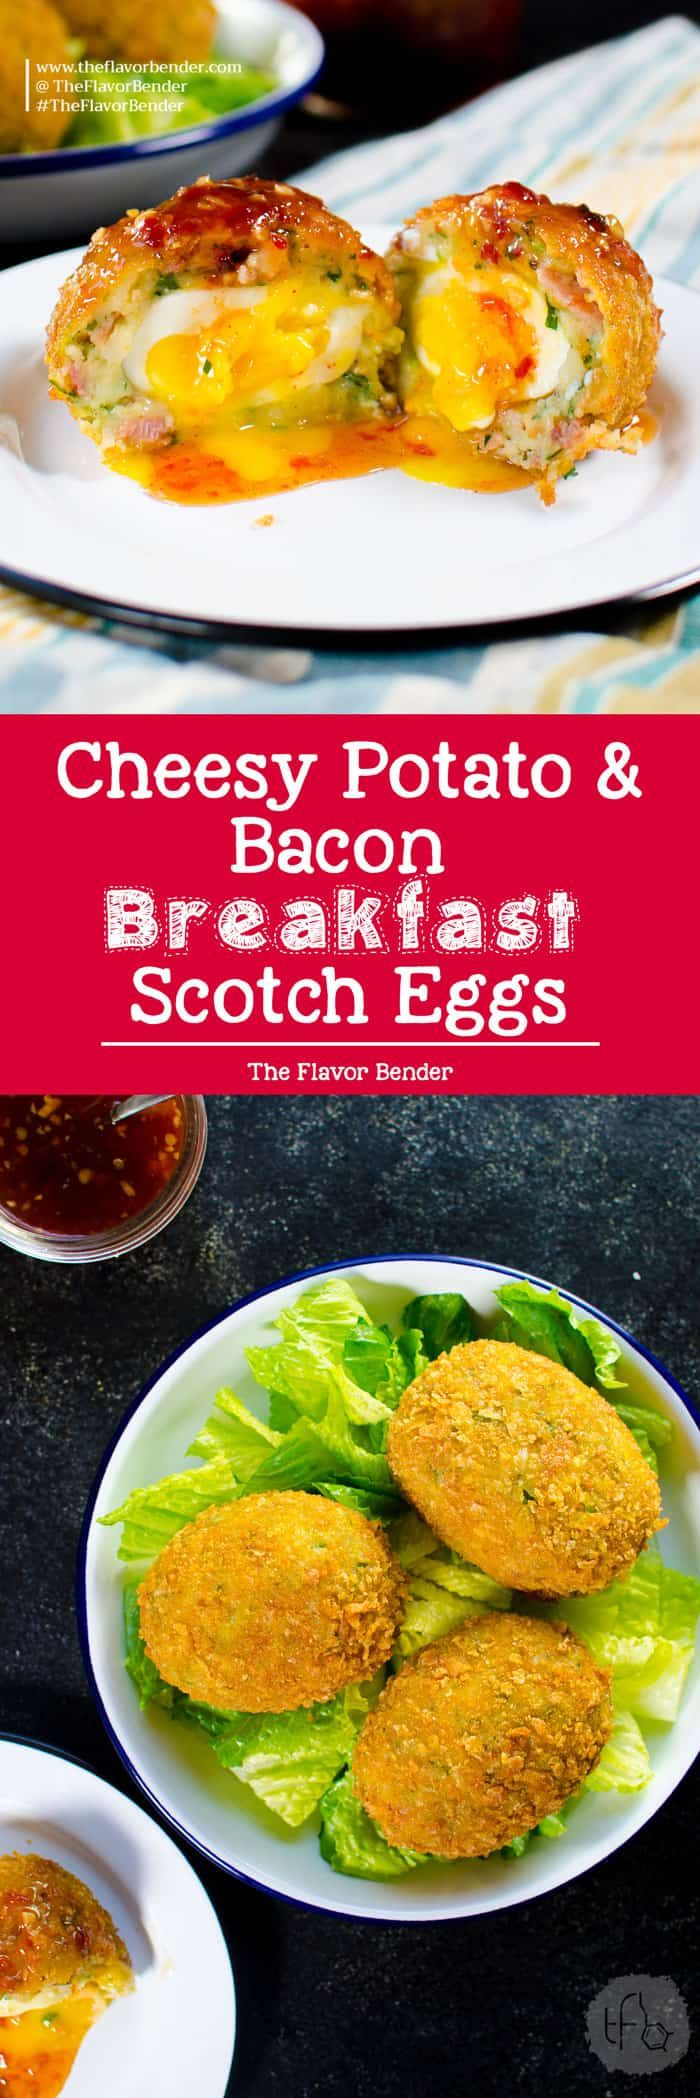 Cheesy Potato & Bacon Scotch Eggs. Extra special Breakfast Scotch eggs with Cheese, Potato, Bacon! Perfect Brunch or Breakfast Eggs. via @theflavorbender